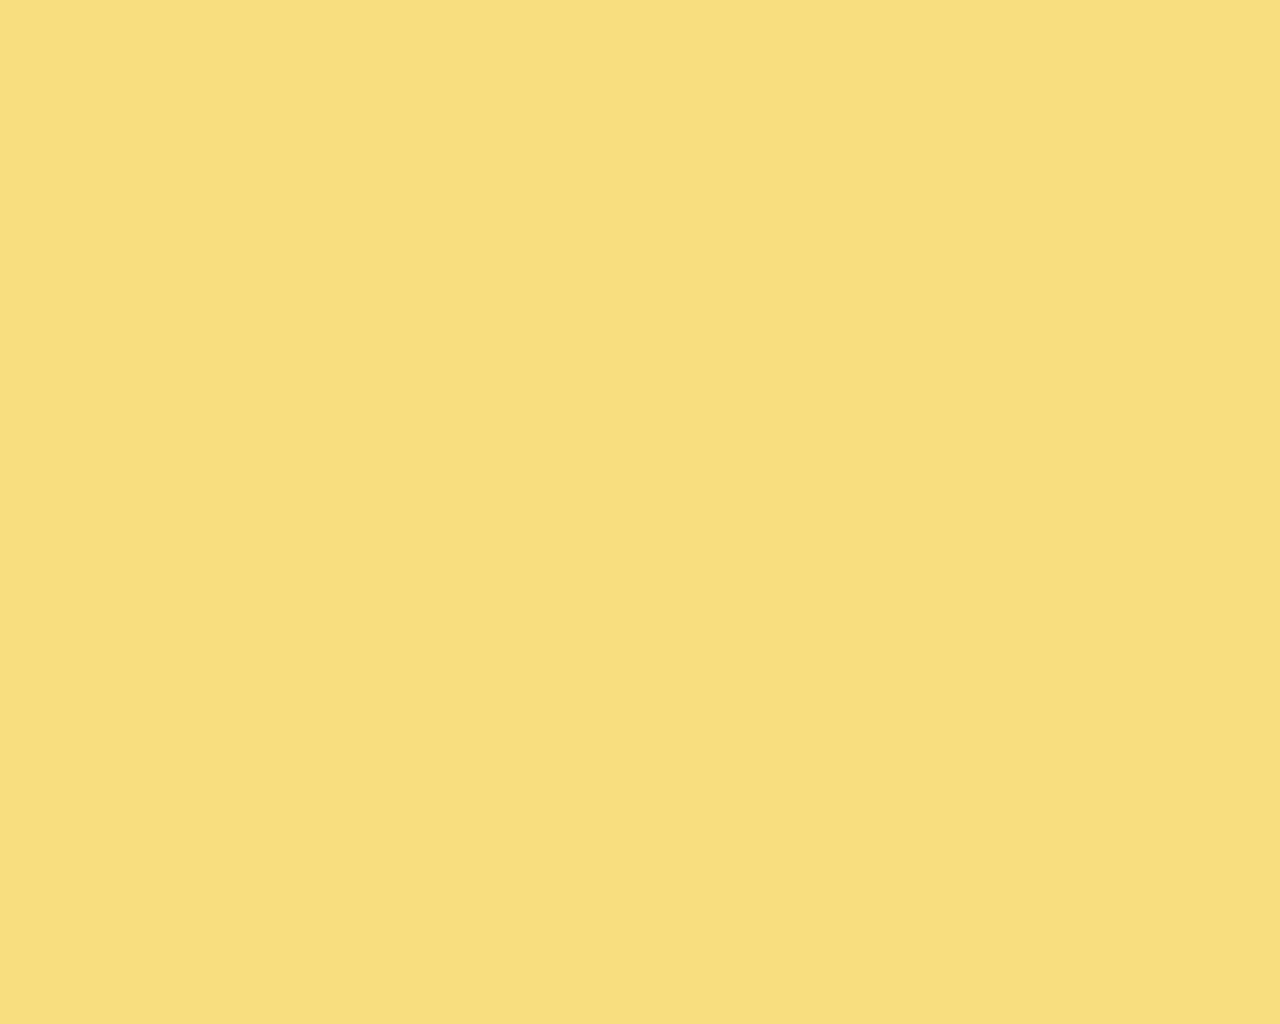 1280x1024 Jasmine Solid Color Background